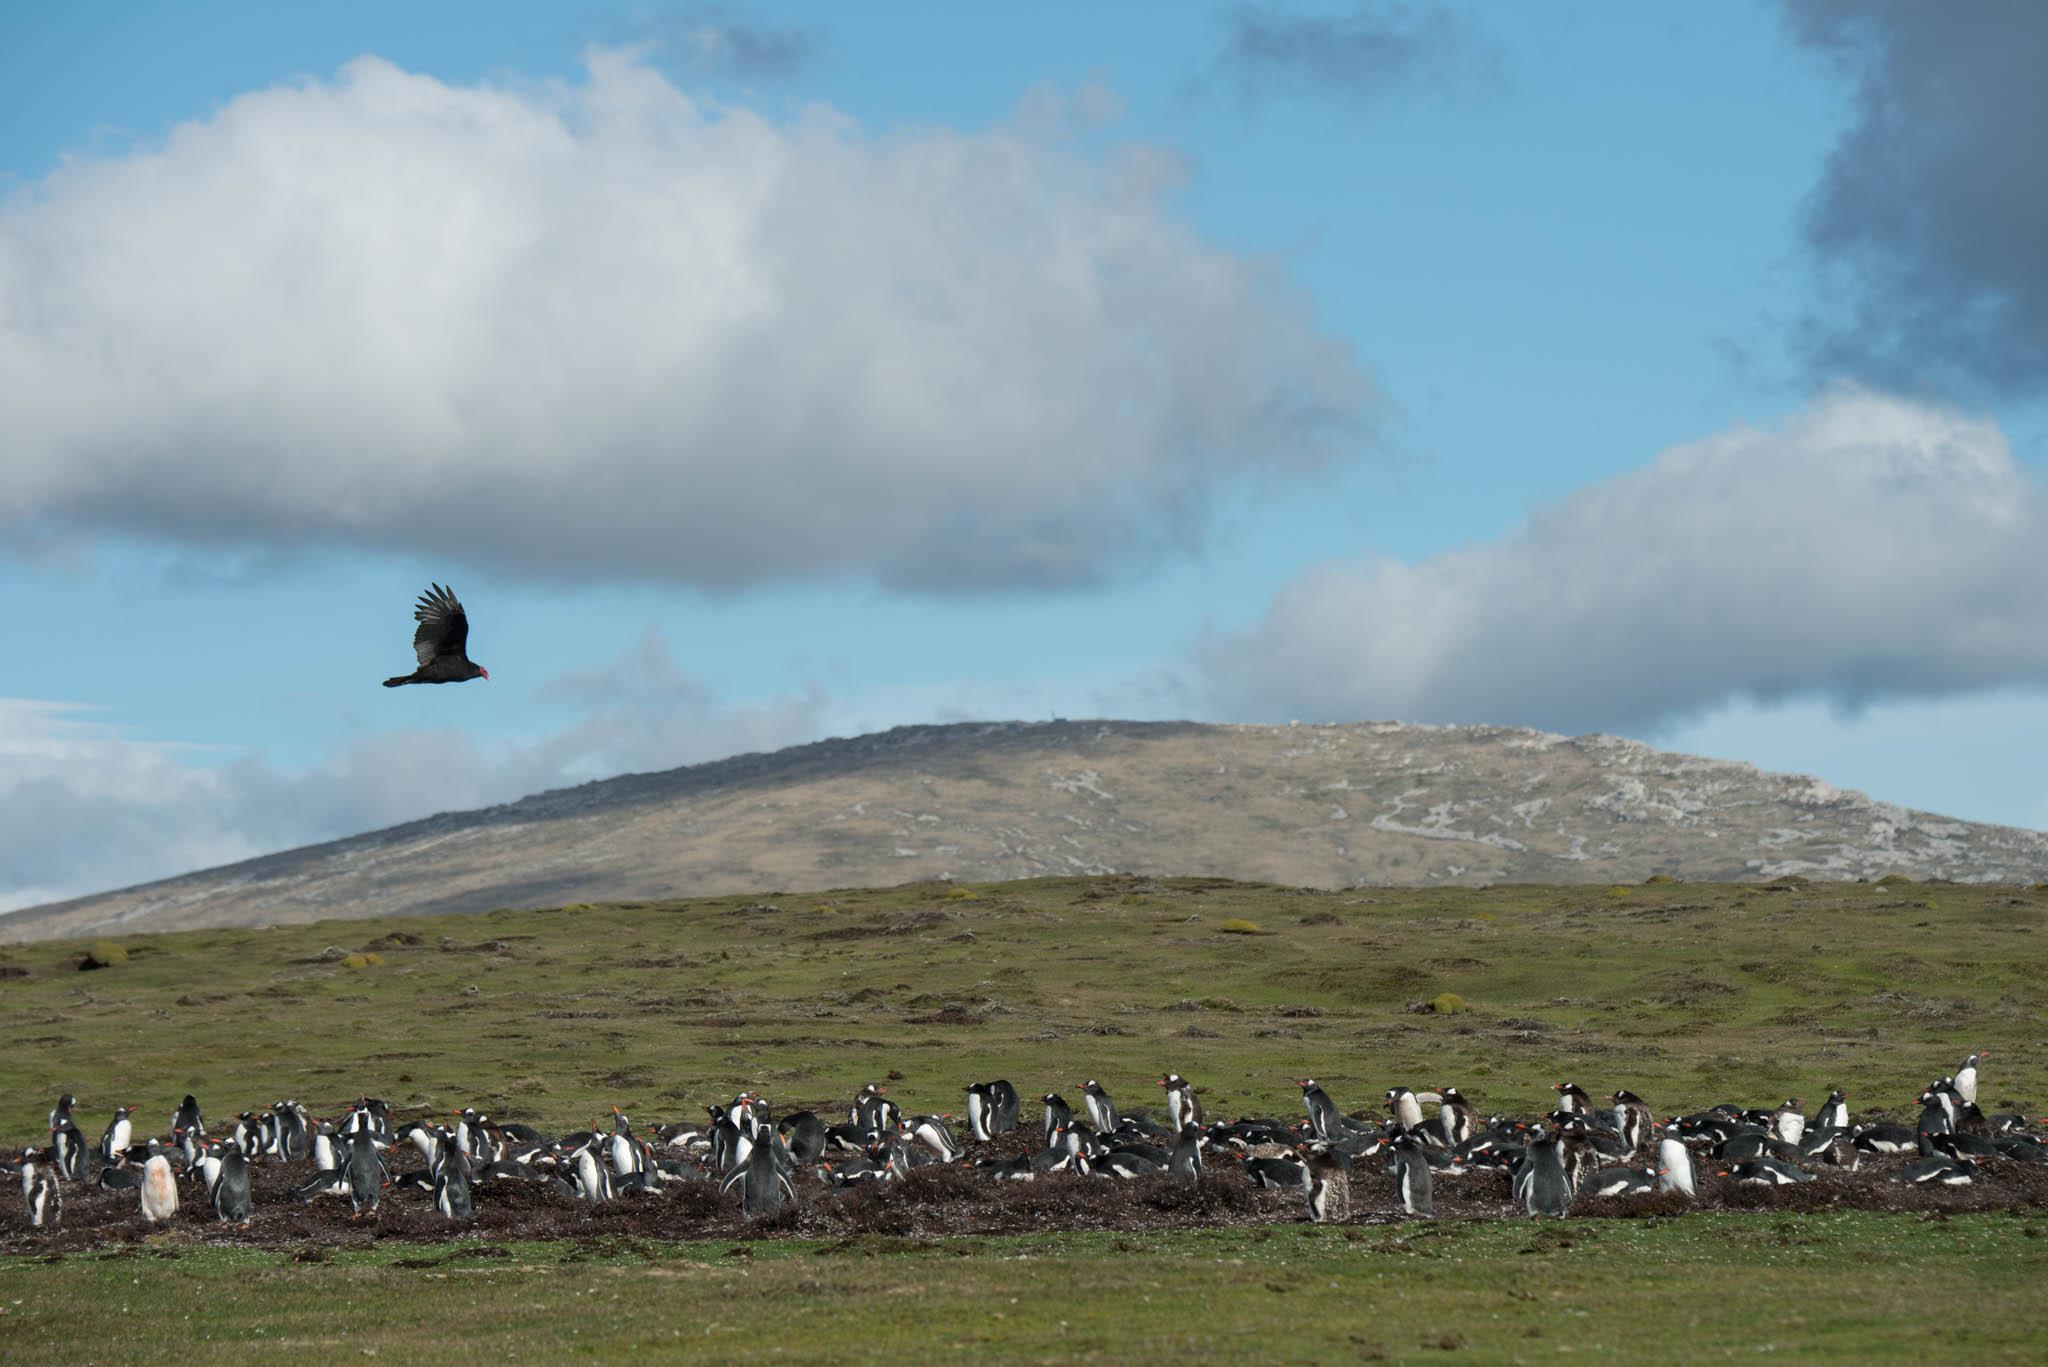 Turkey Vulture overflying Gentoo Penguins